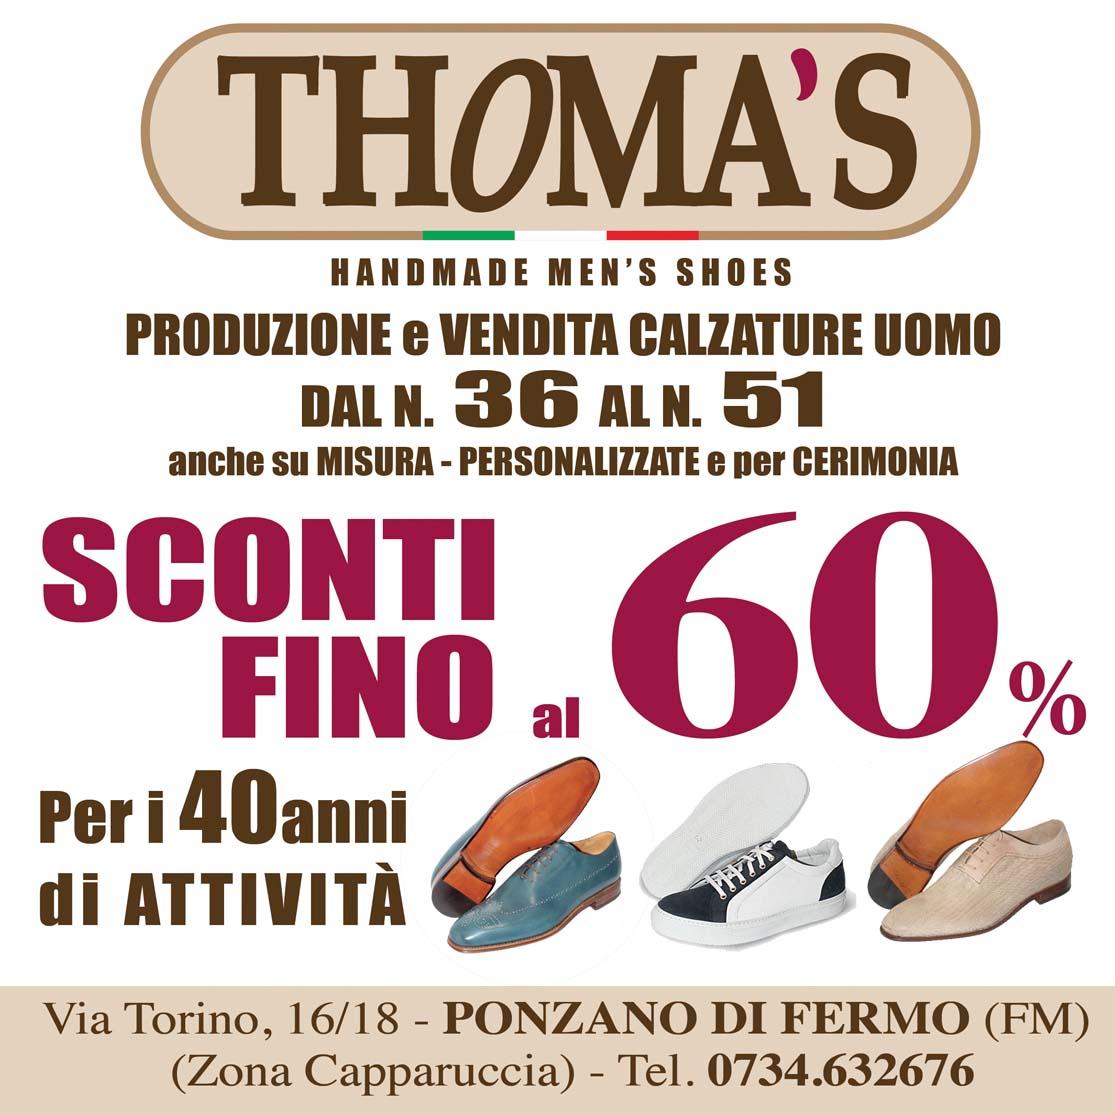 Thoma's